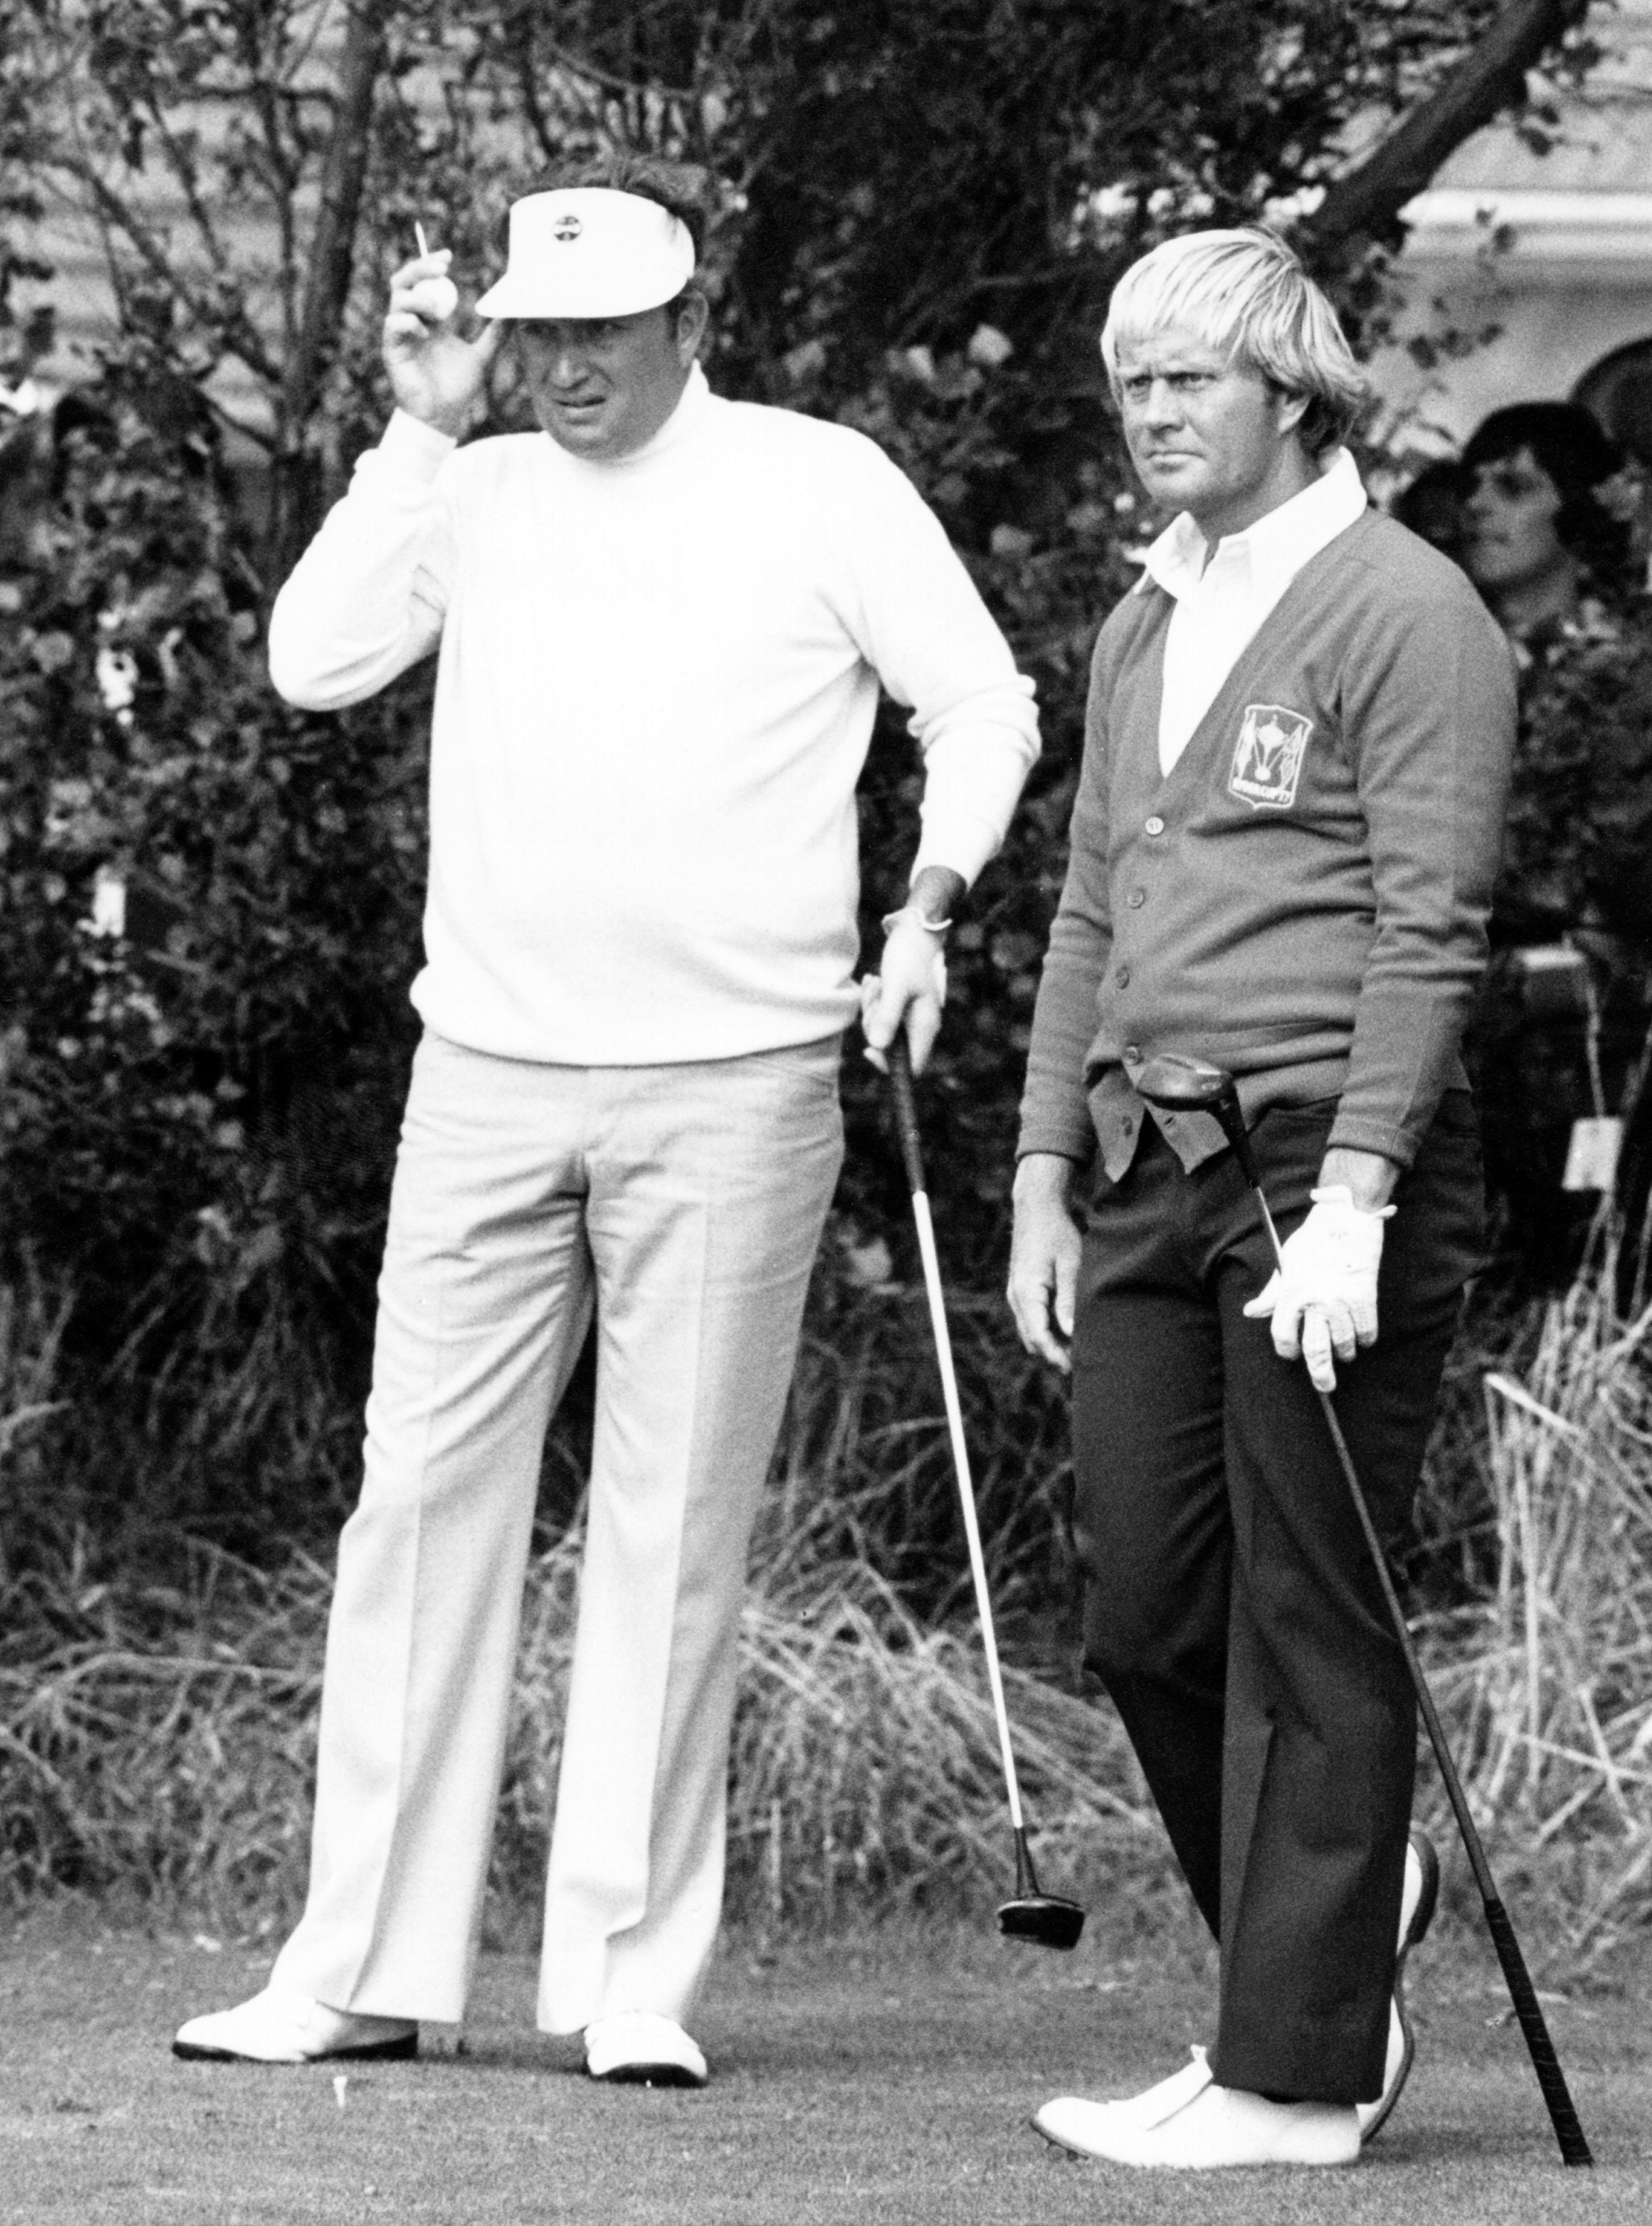 7. 1980: Despite loss to Floyd, Jack is back